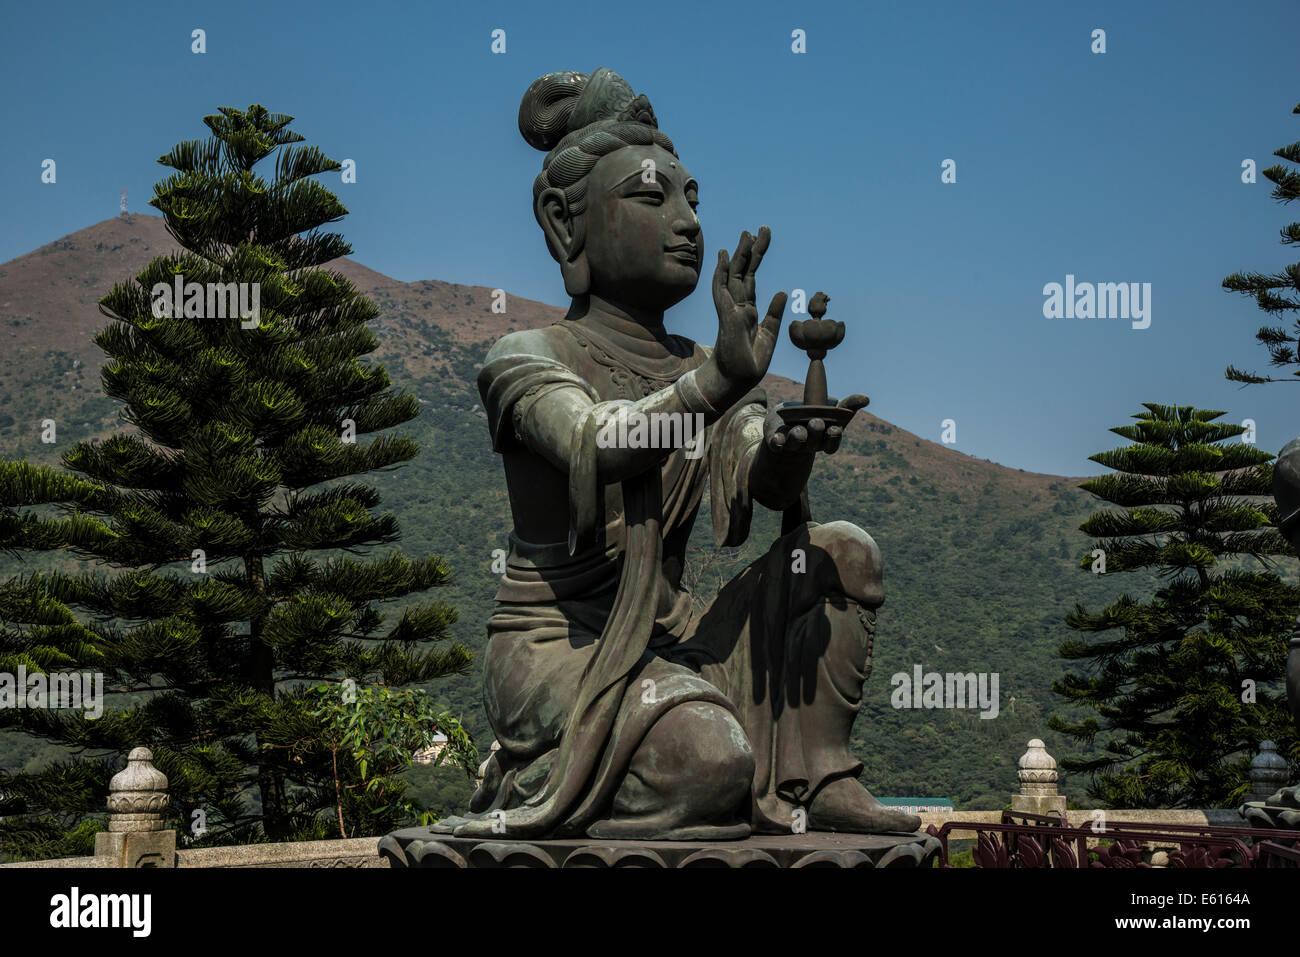 Buddhist statue praising Tian Tan Buddha or the Big Buddha, Lantau Island, Hong Kong, China - Stock Image